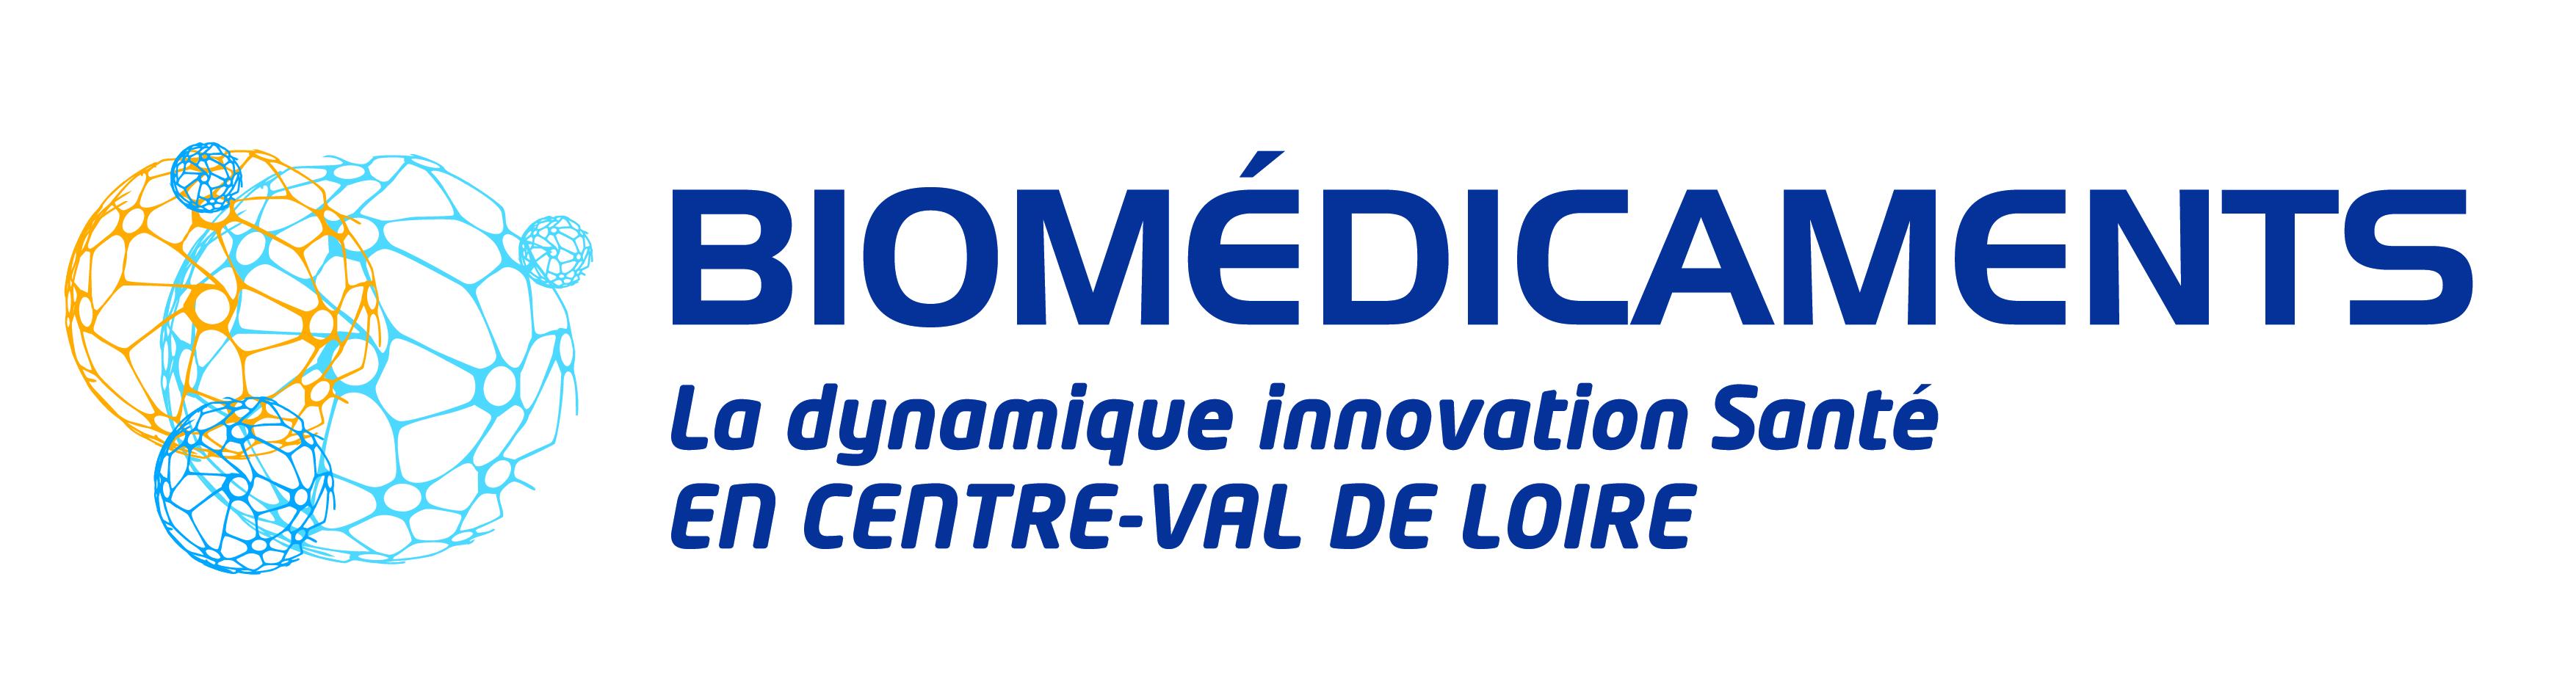 Logotype_Biome_dicaments_CMJN.jpg